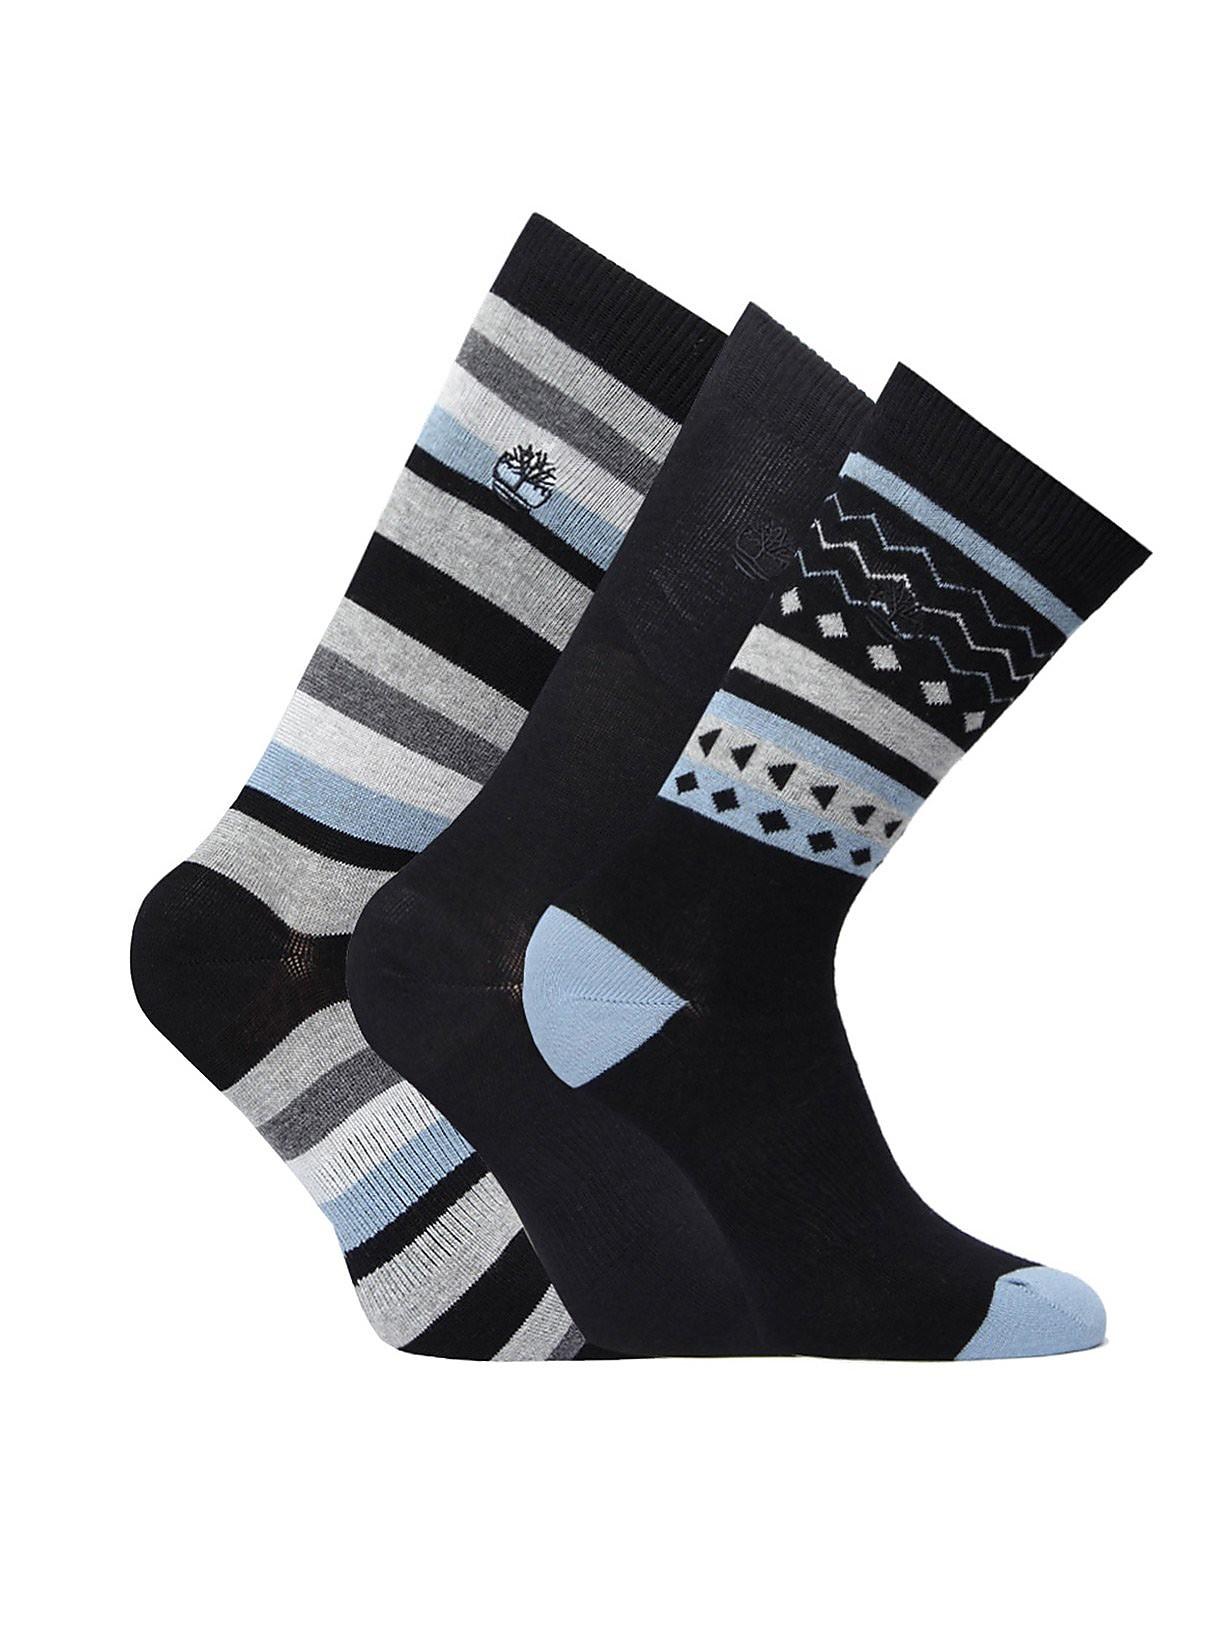 Timberland Men's Three Pack Stripe Rib Socks - Black